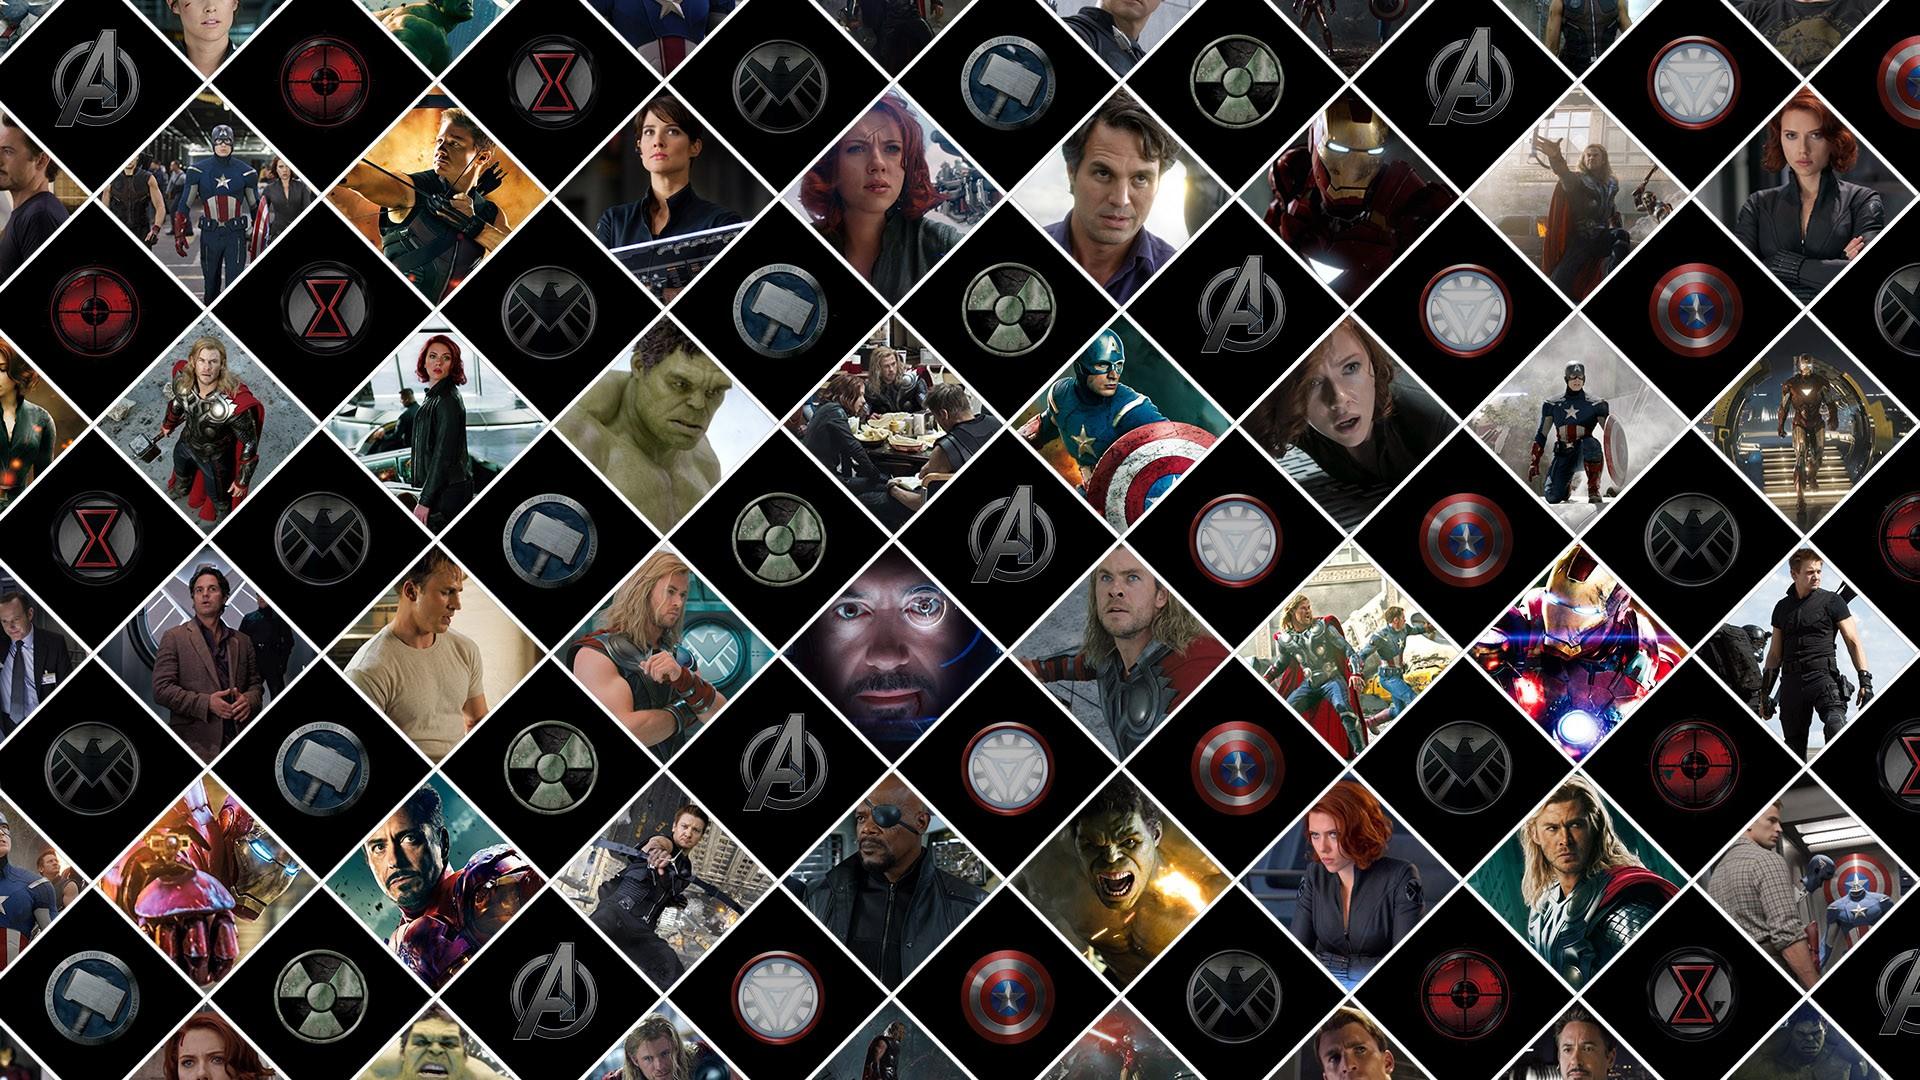 Hd wallpaper pattern - Marvel The Avengers Wallpaper Wallpapersafari